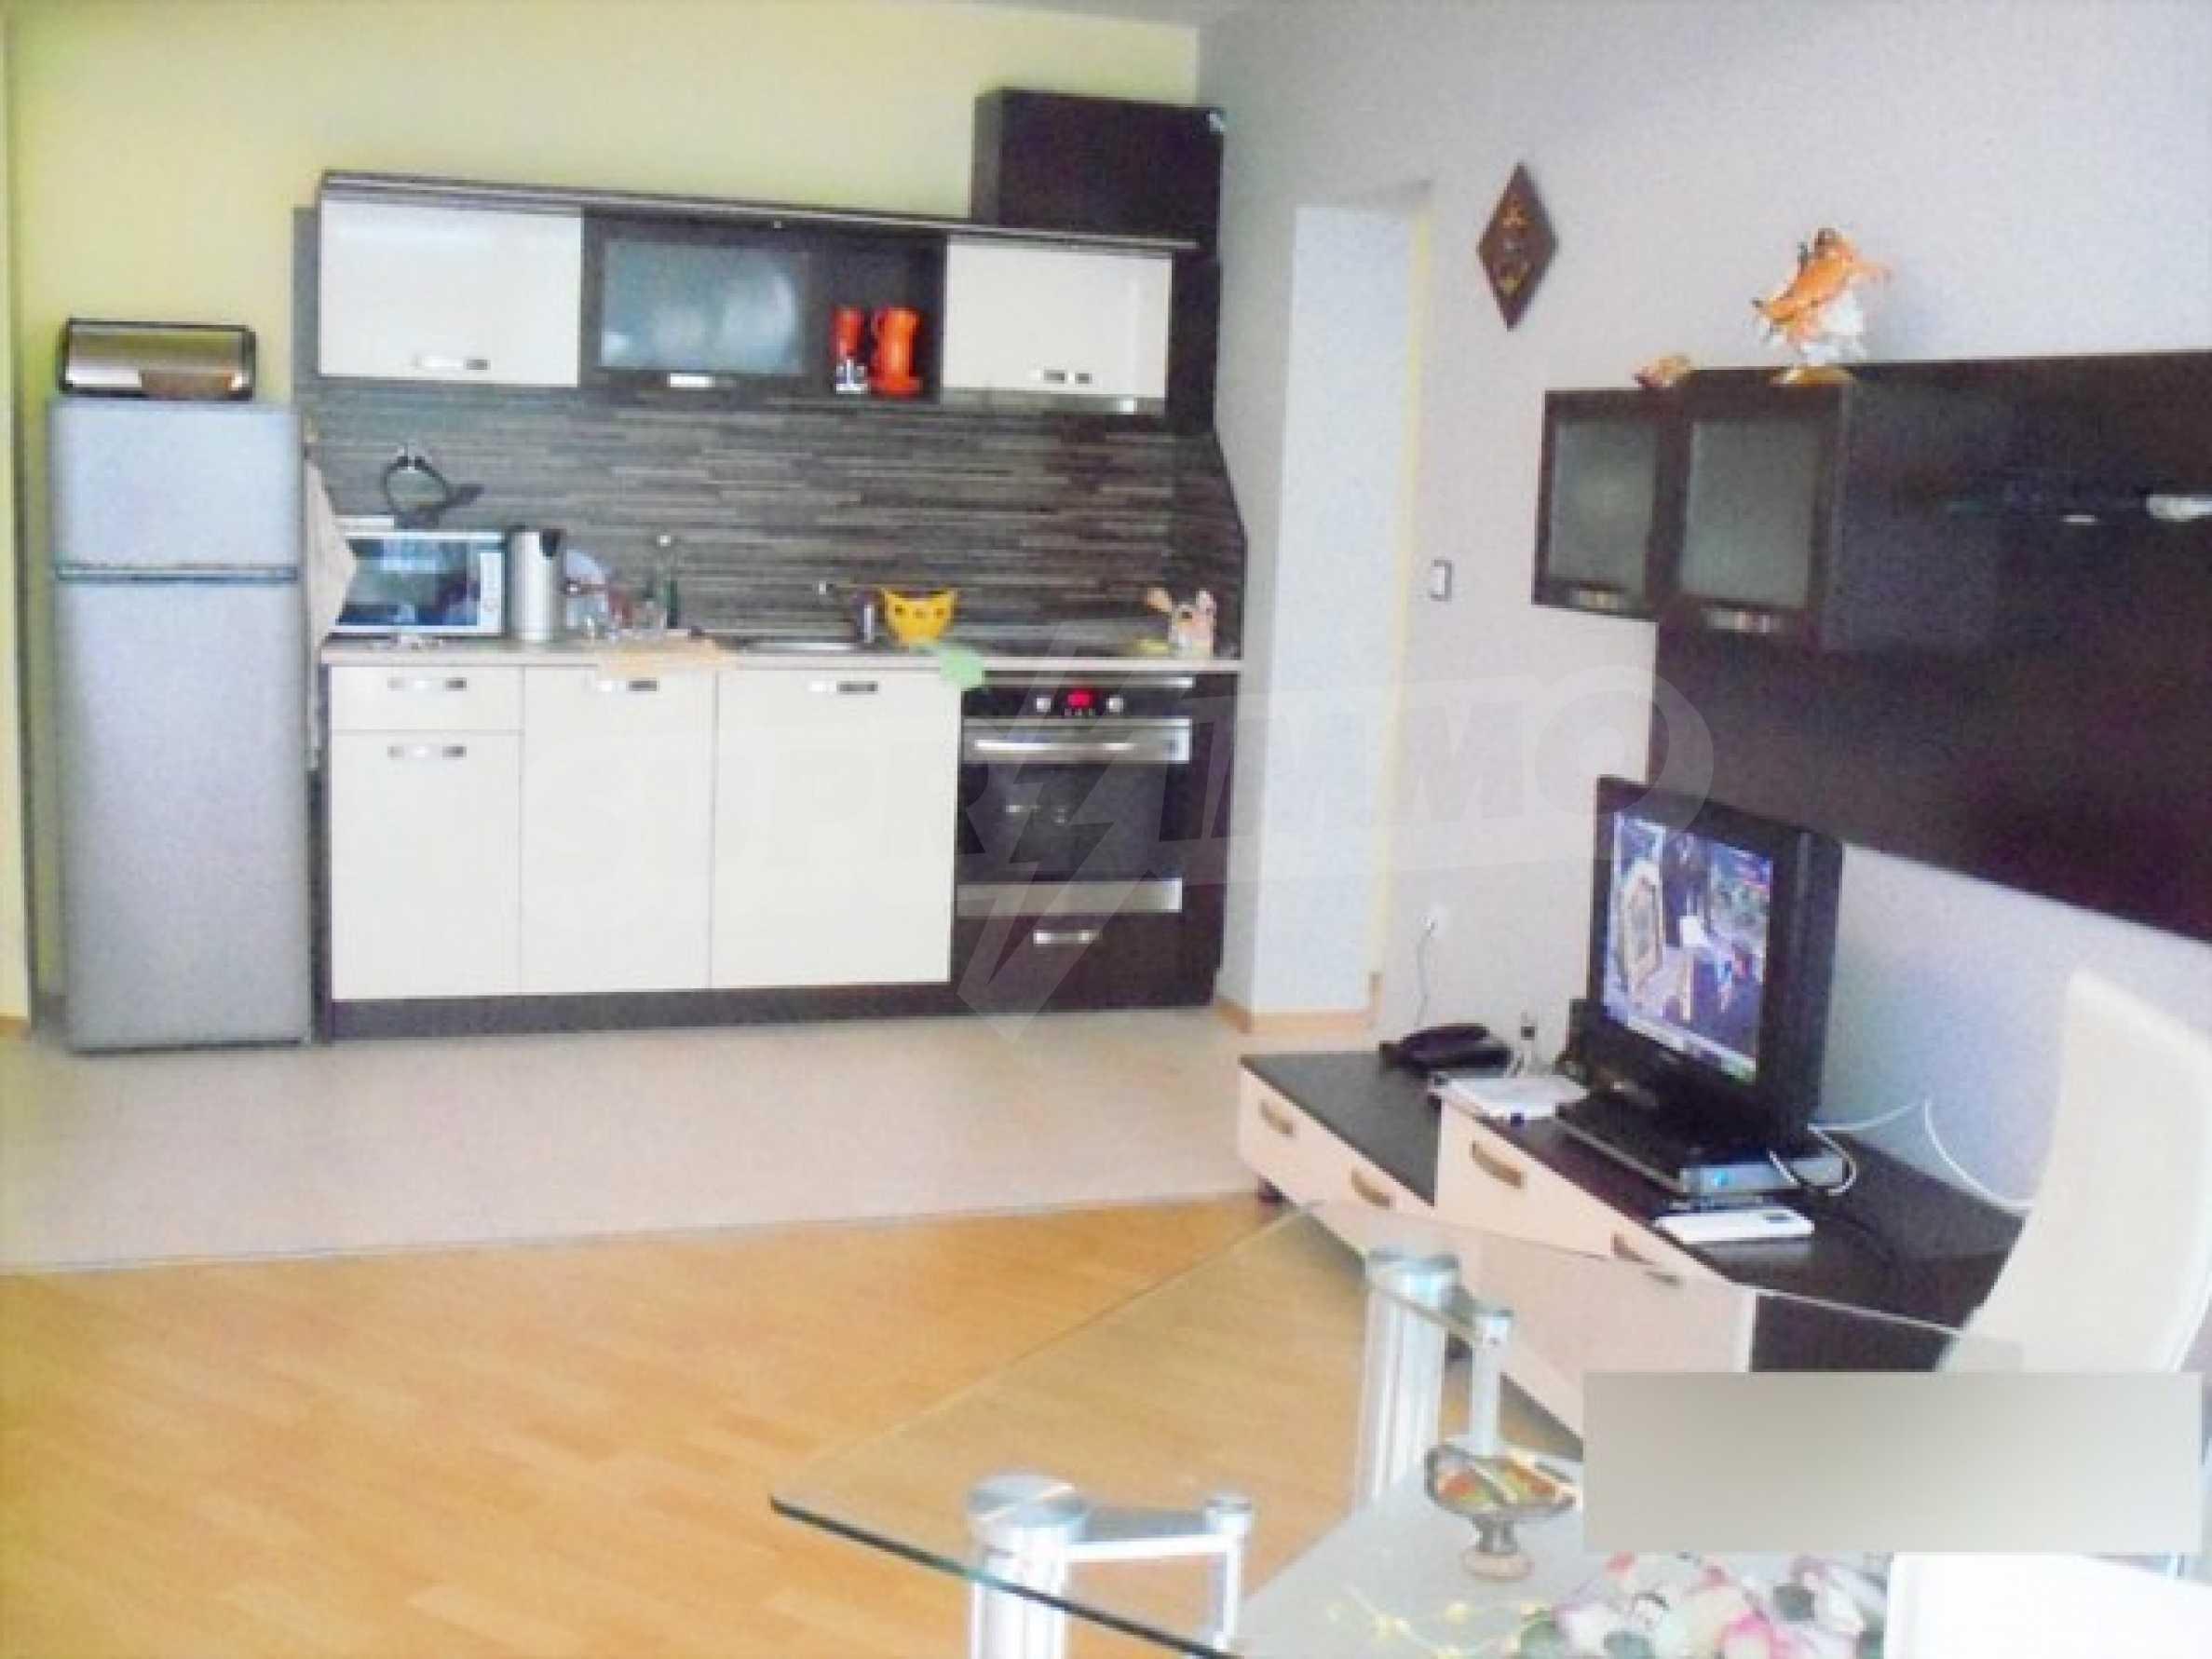 Тристаен апартамент за продажба в Поморие 8